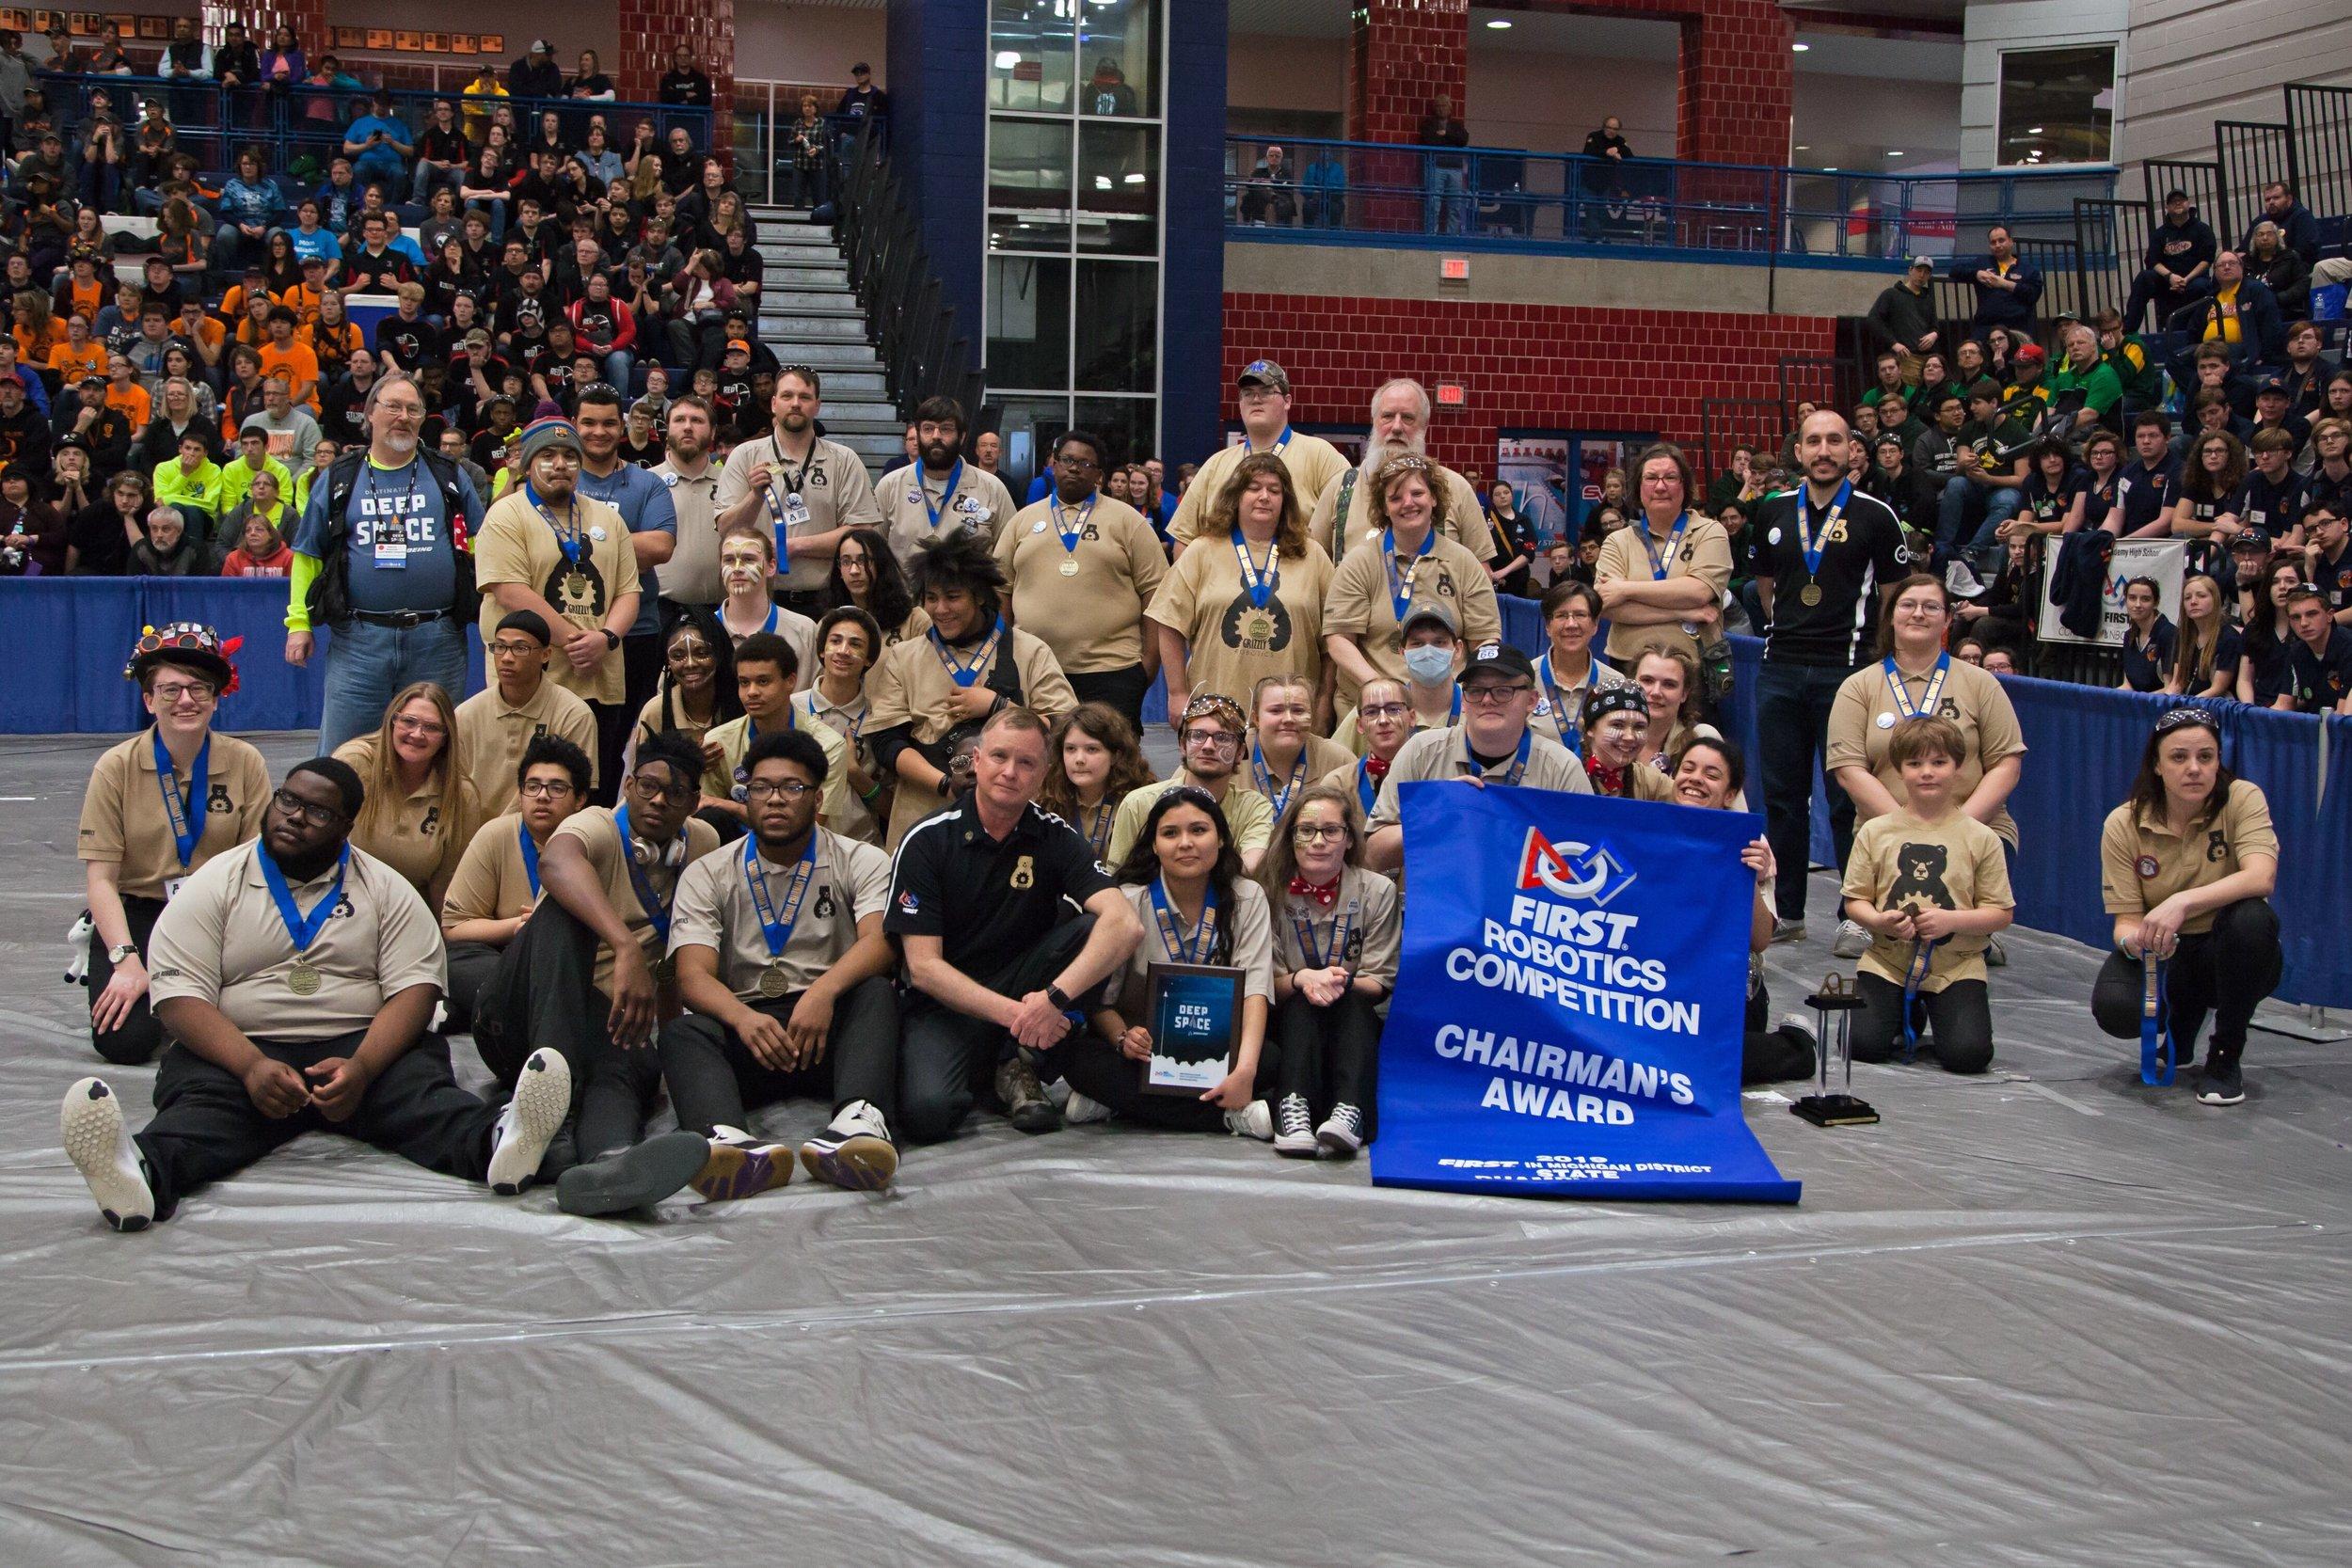 Grizzly Robotics Win the 2019 Michigan State Championship Chairman's Award